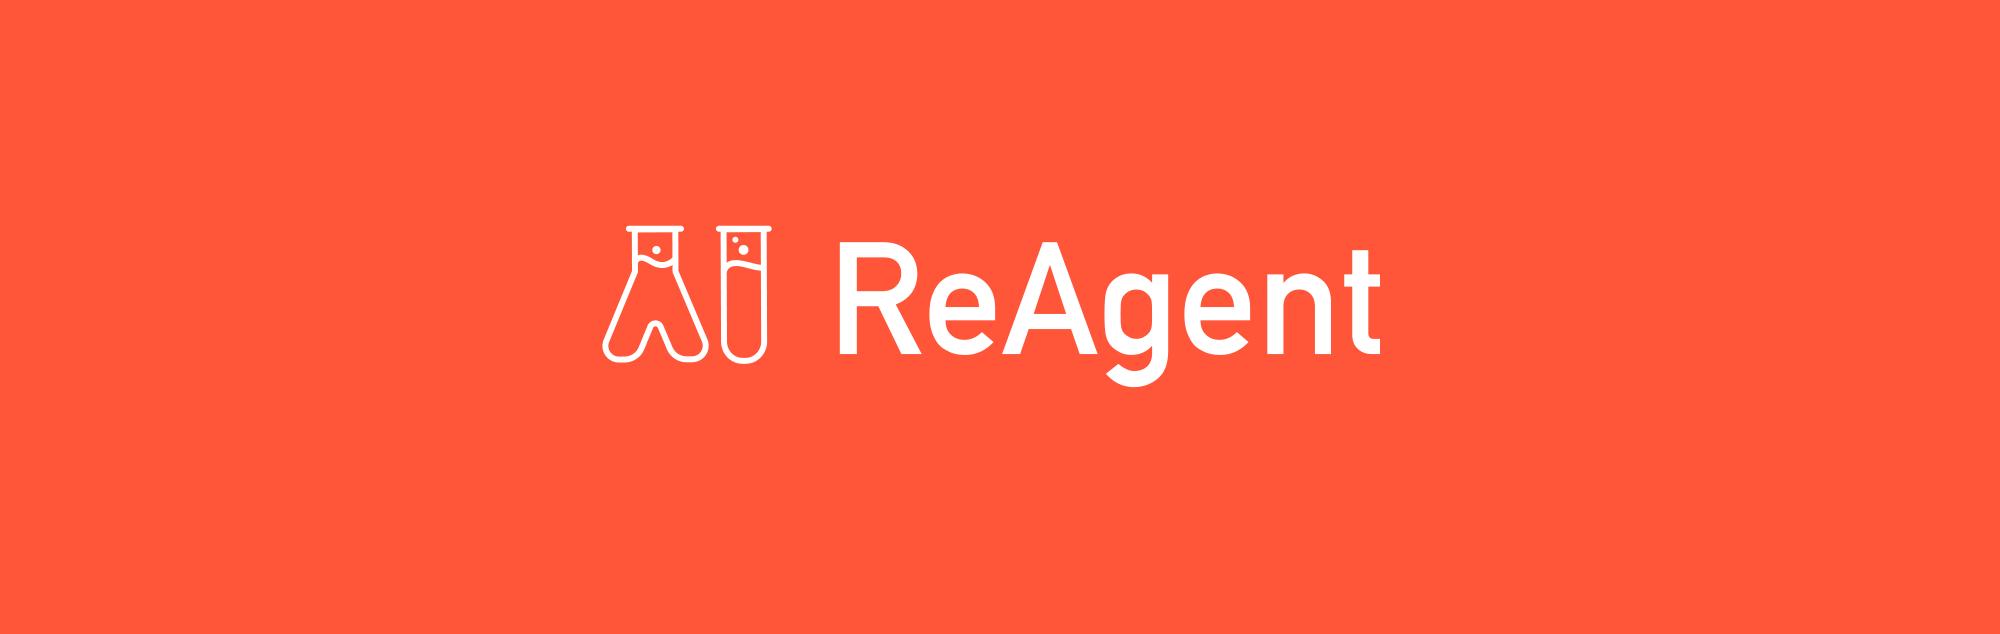 ReAgent: Applied Reinforcement Learning Platform — ReAgent 1.0 documentation